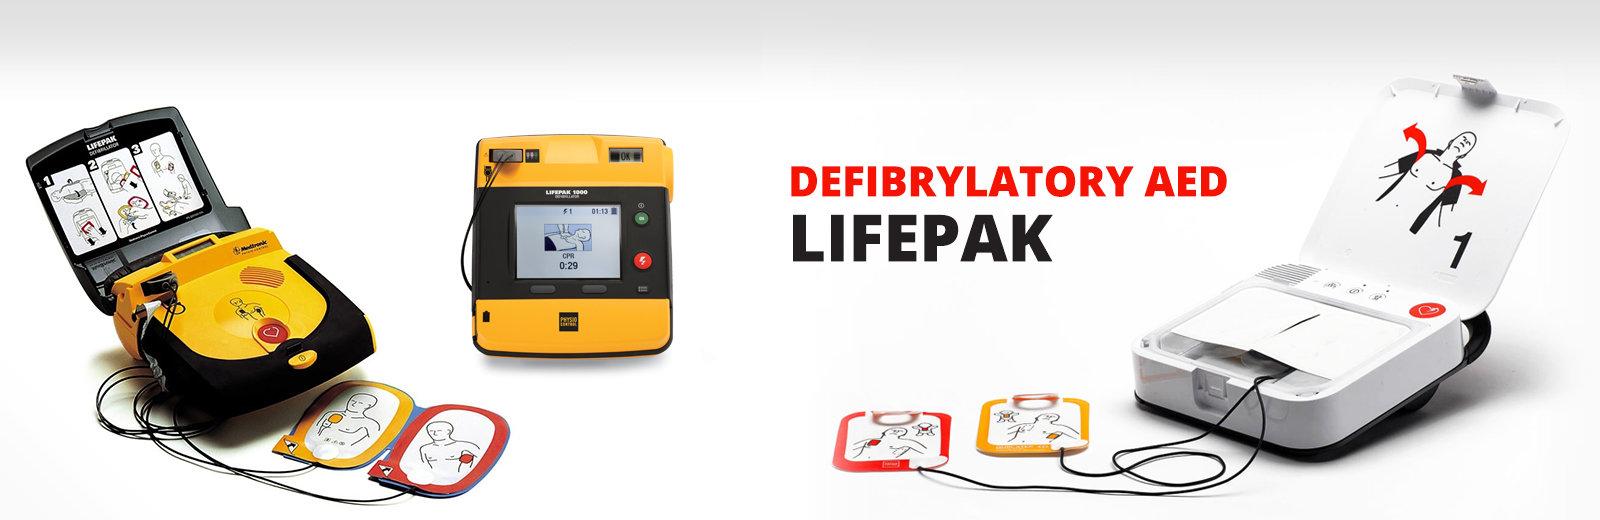 Defibrylatory AED Lifepak